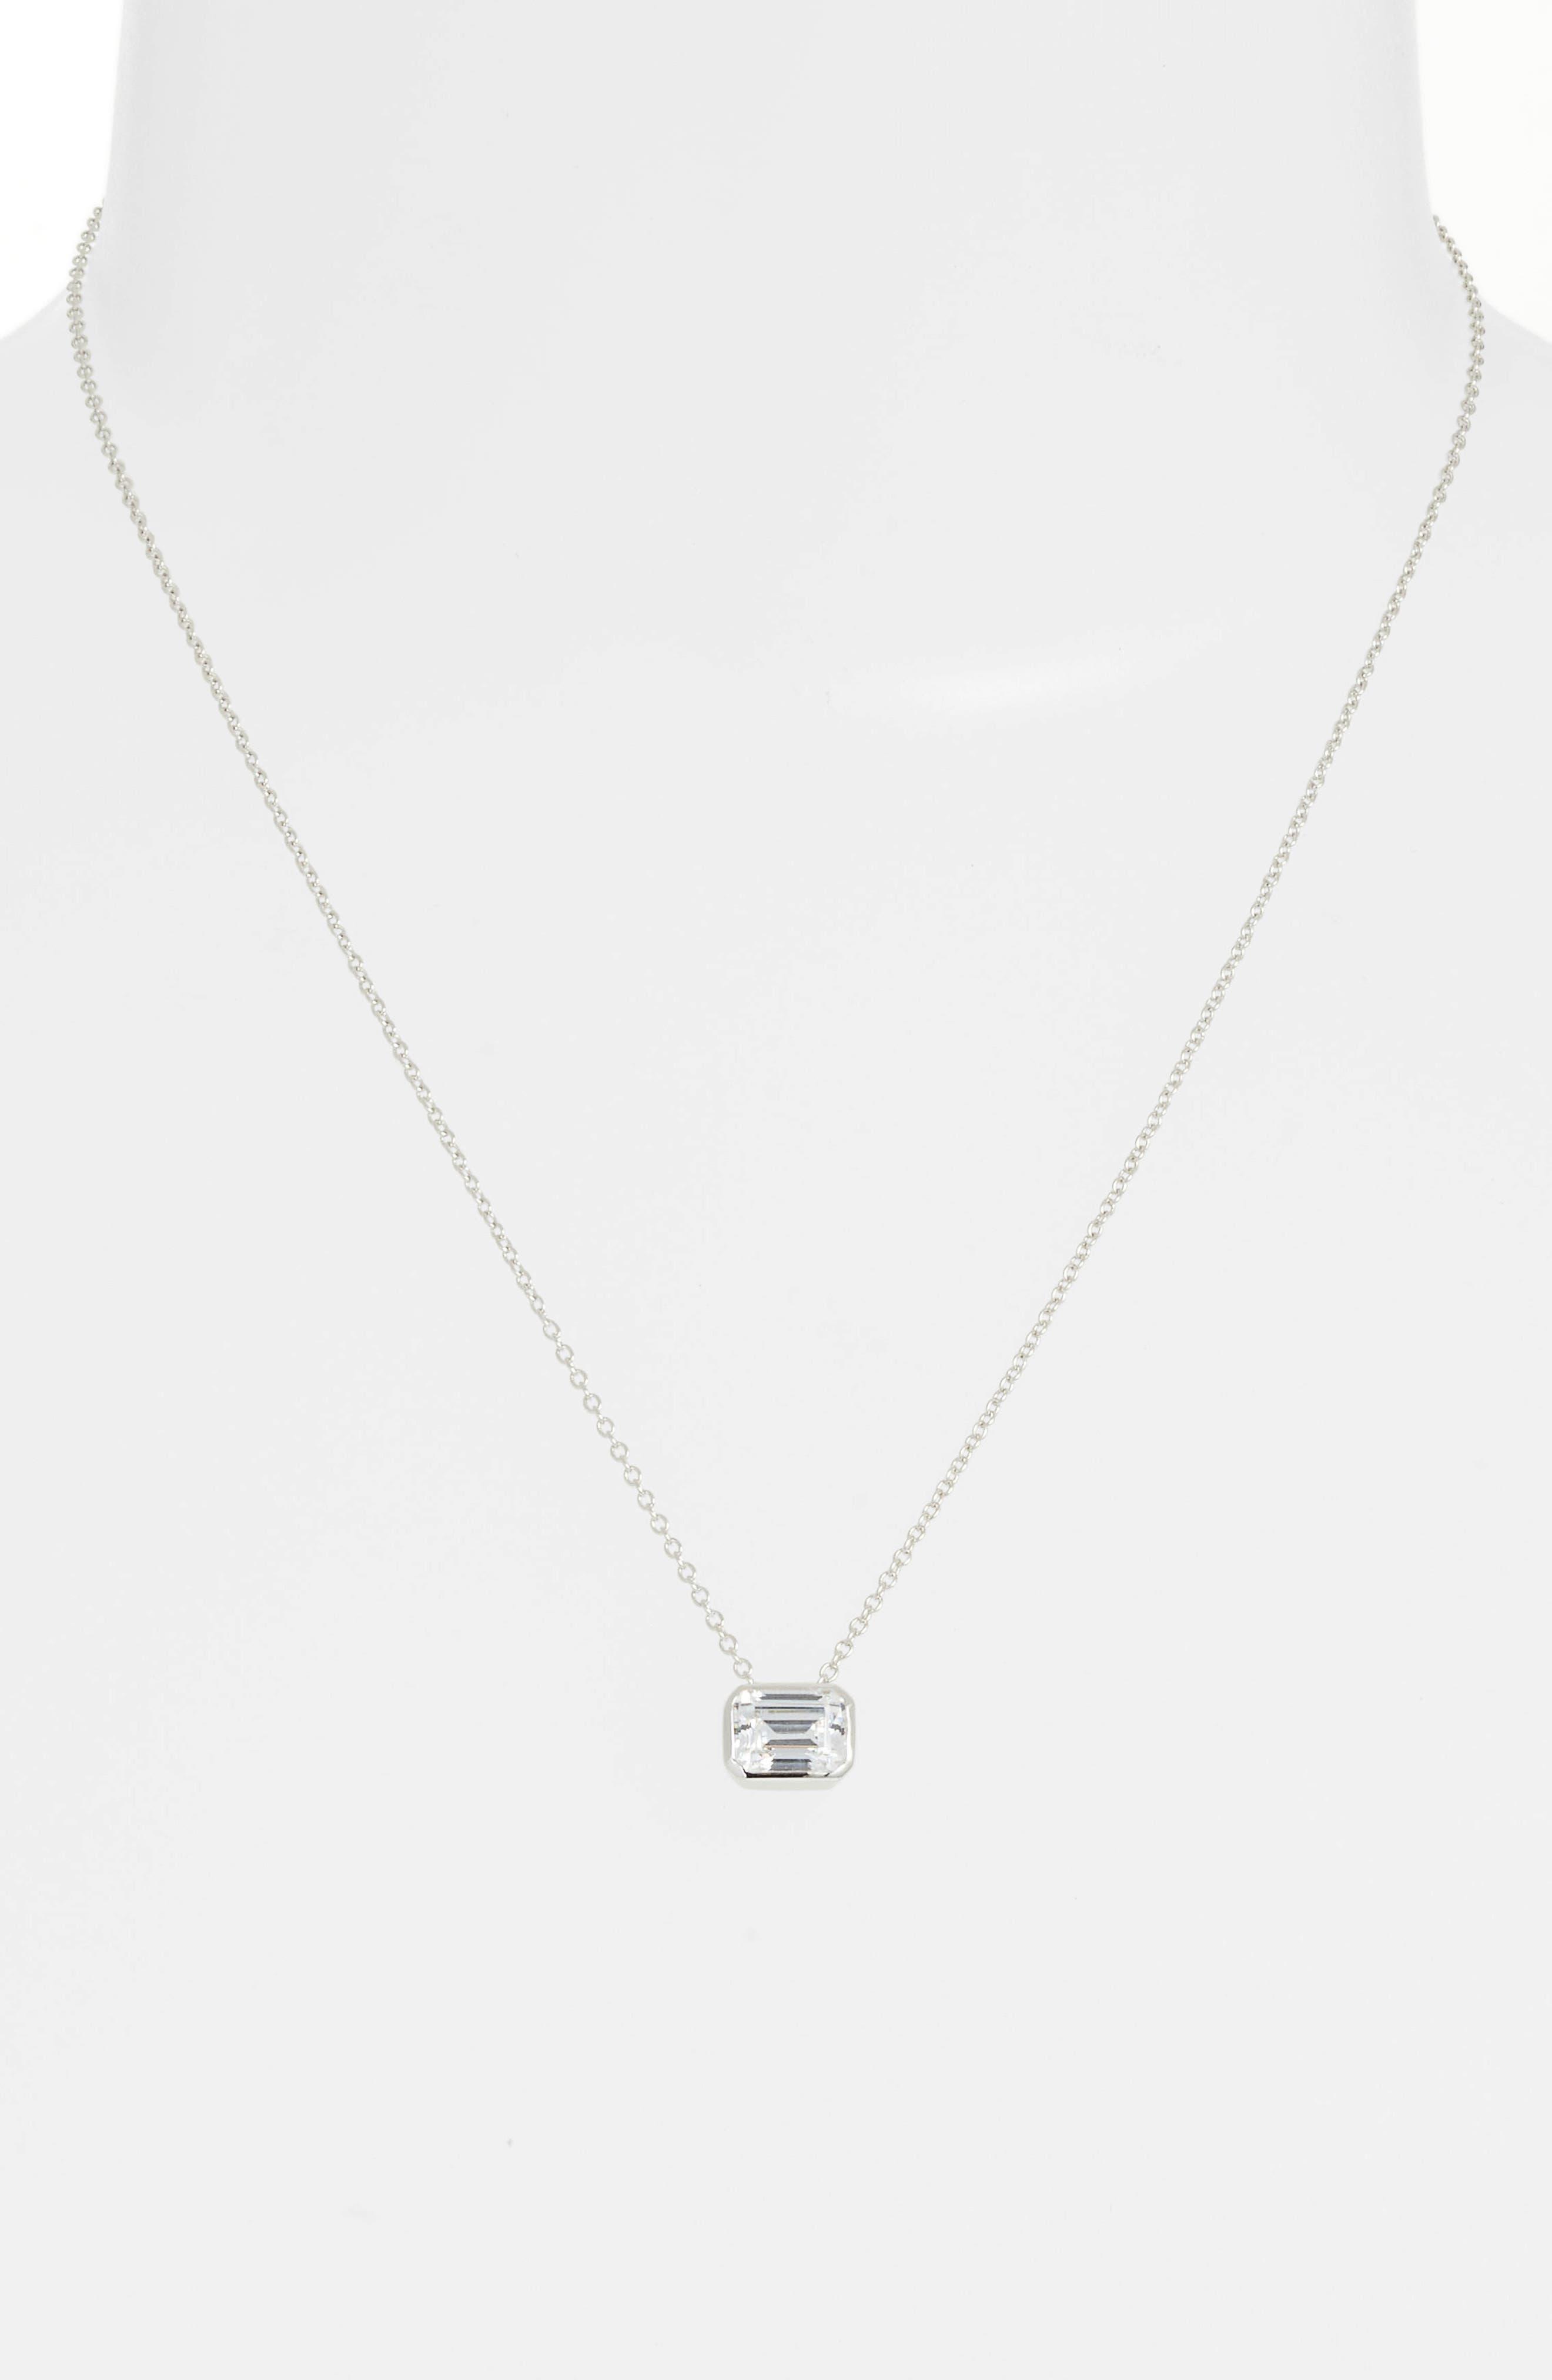 Bezel-Set Emerald-Cut Choker Necklace,                             Alternate thumbnail 2, color,                             SILVER/ CLEAR